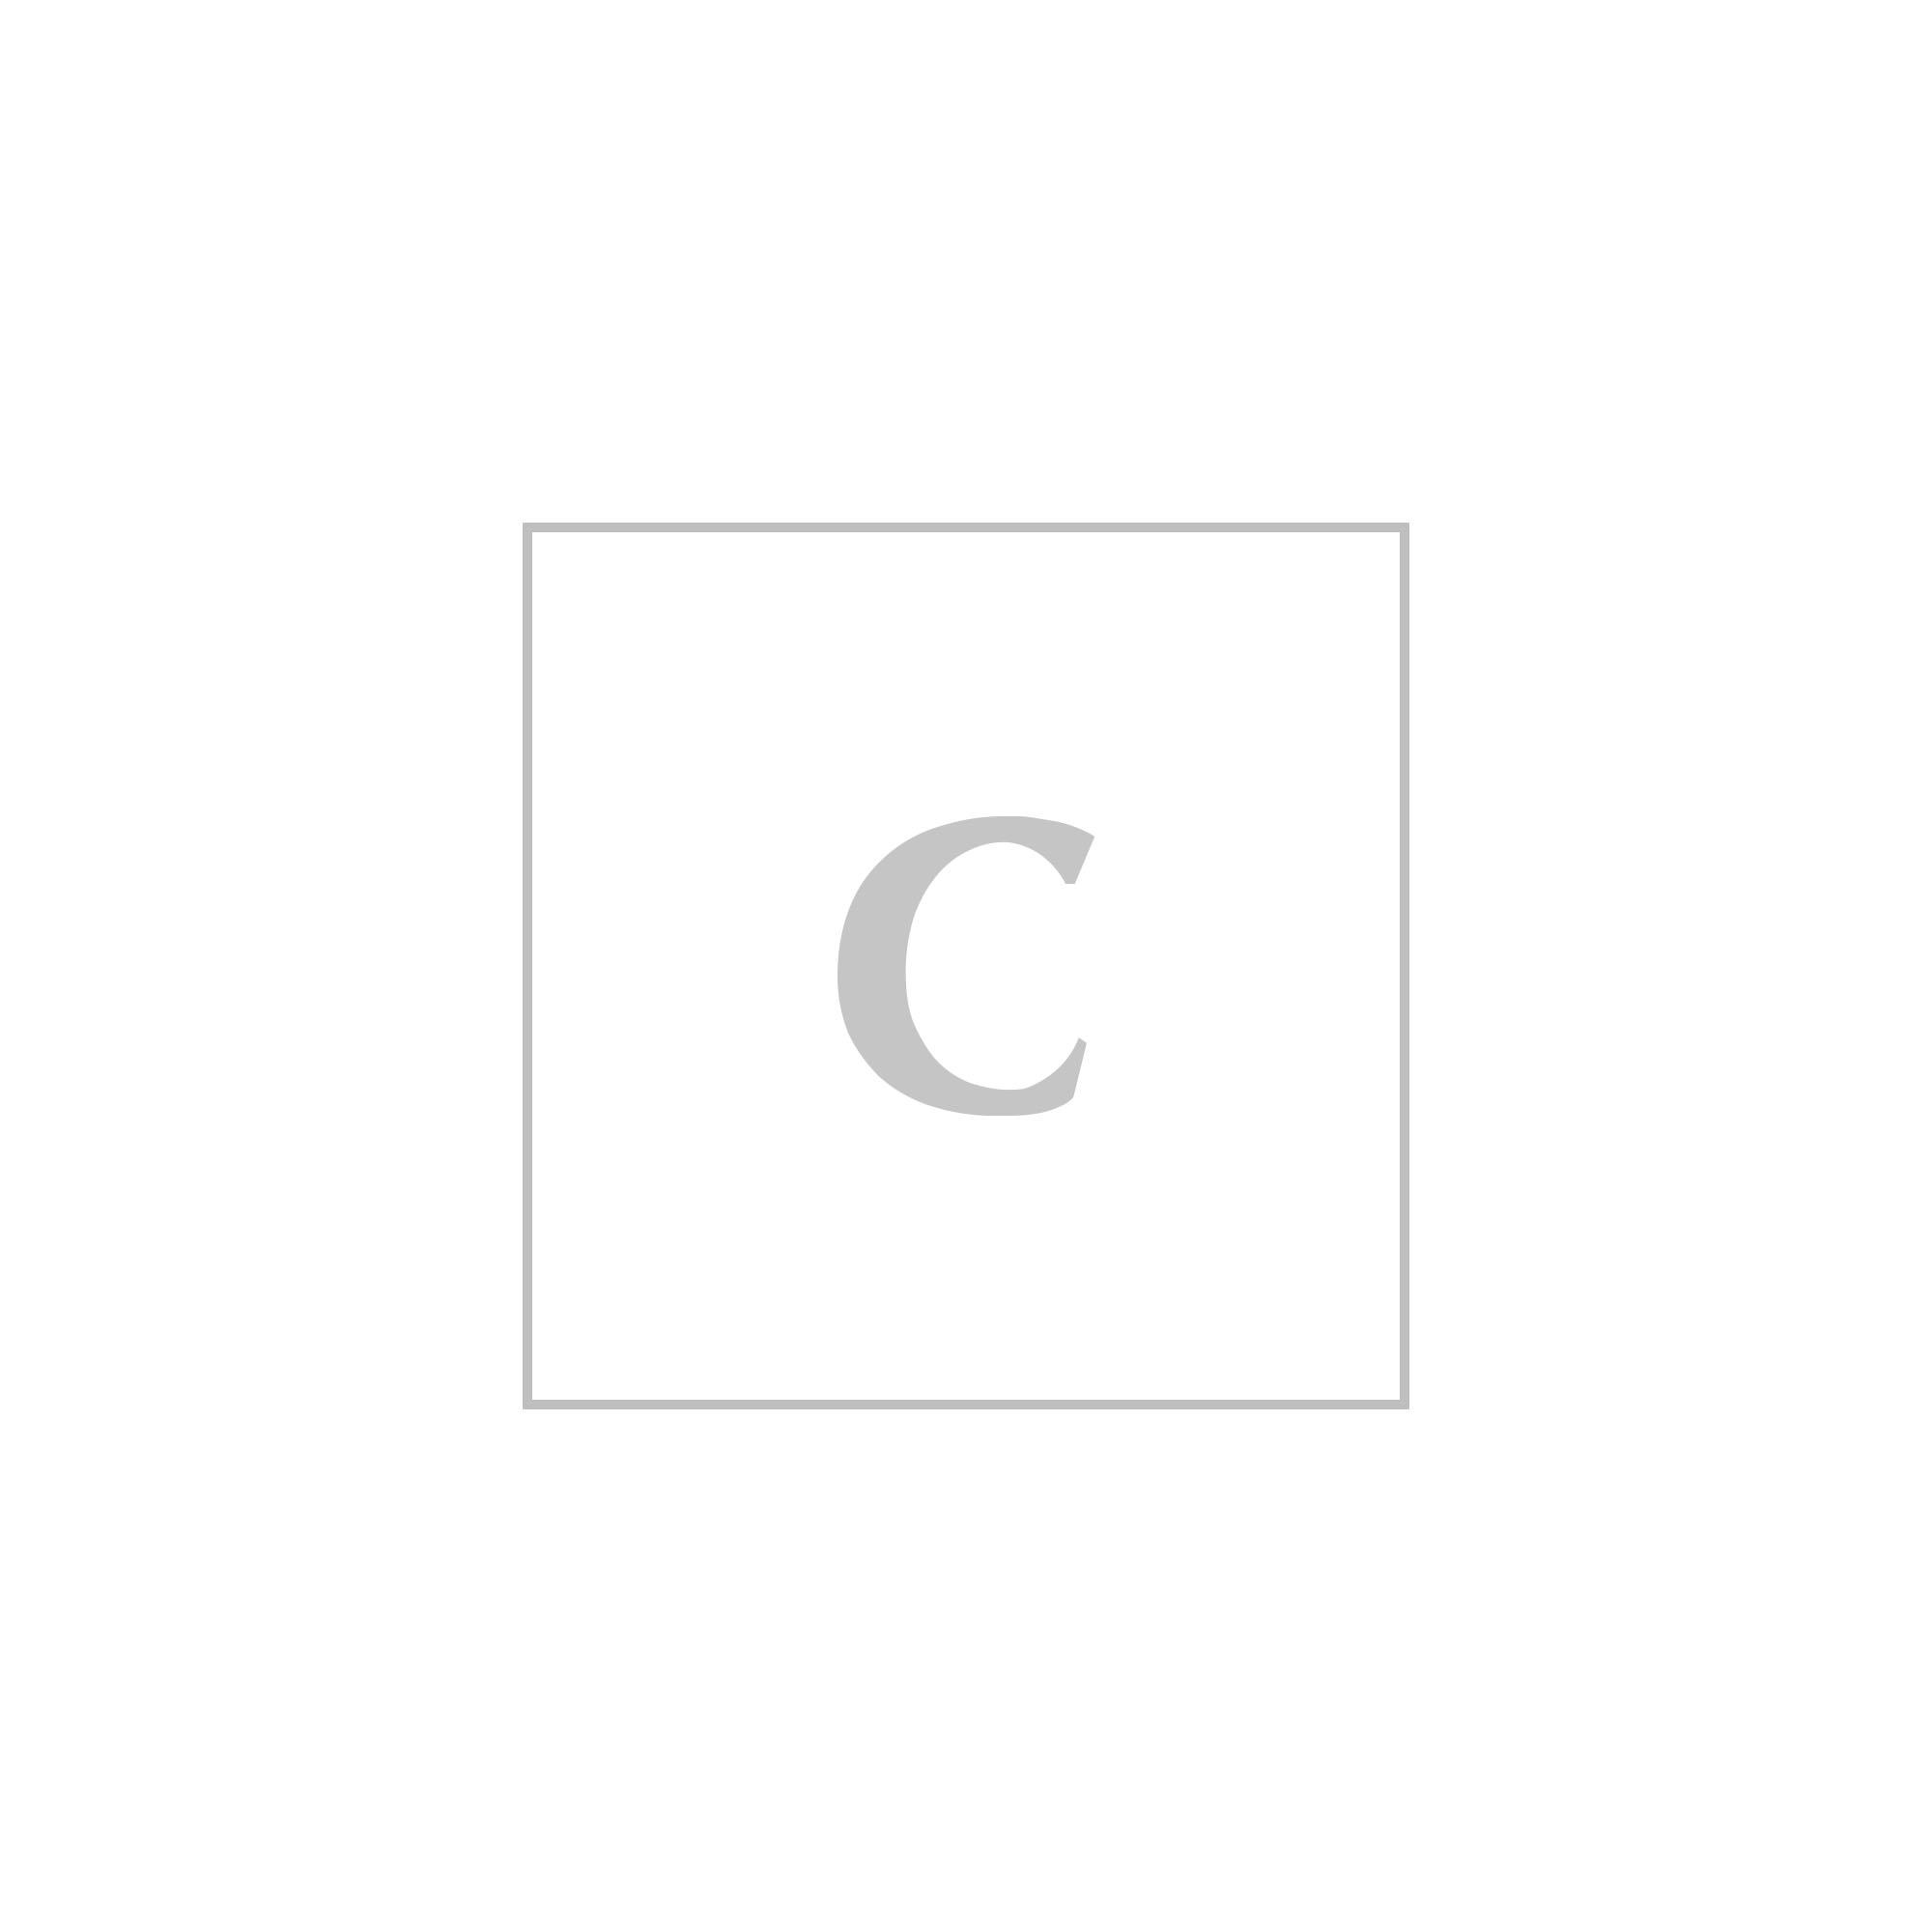 Dolce & gabbana slingback con stampa